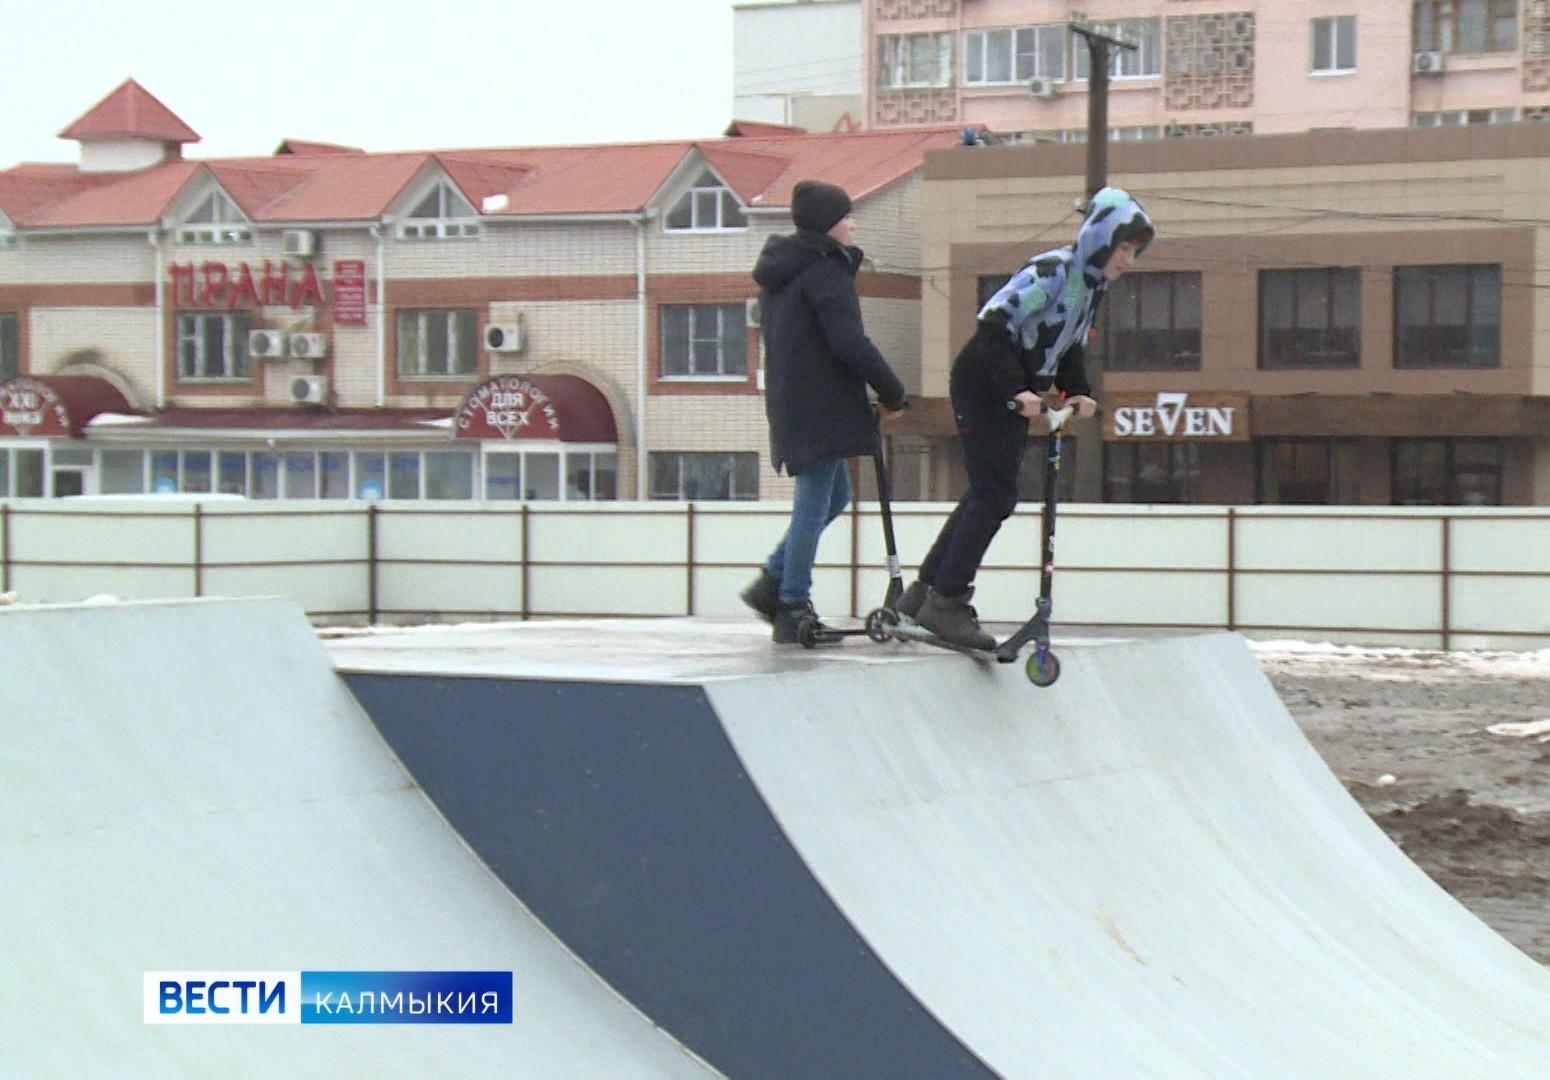 Скейтпарк в 7 микрорайоне уже начал работу